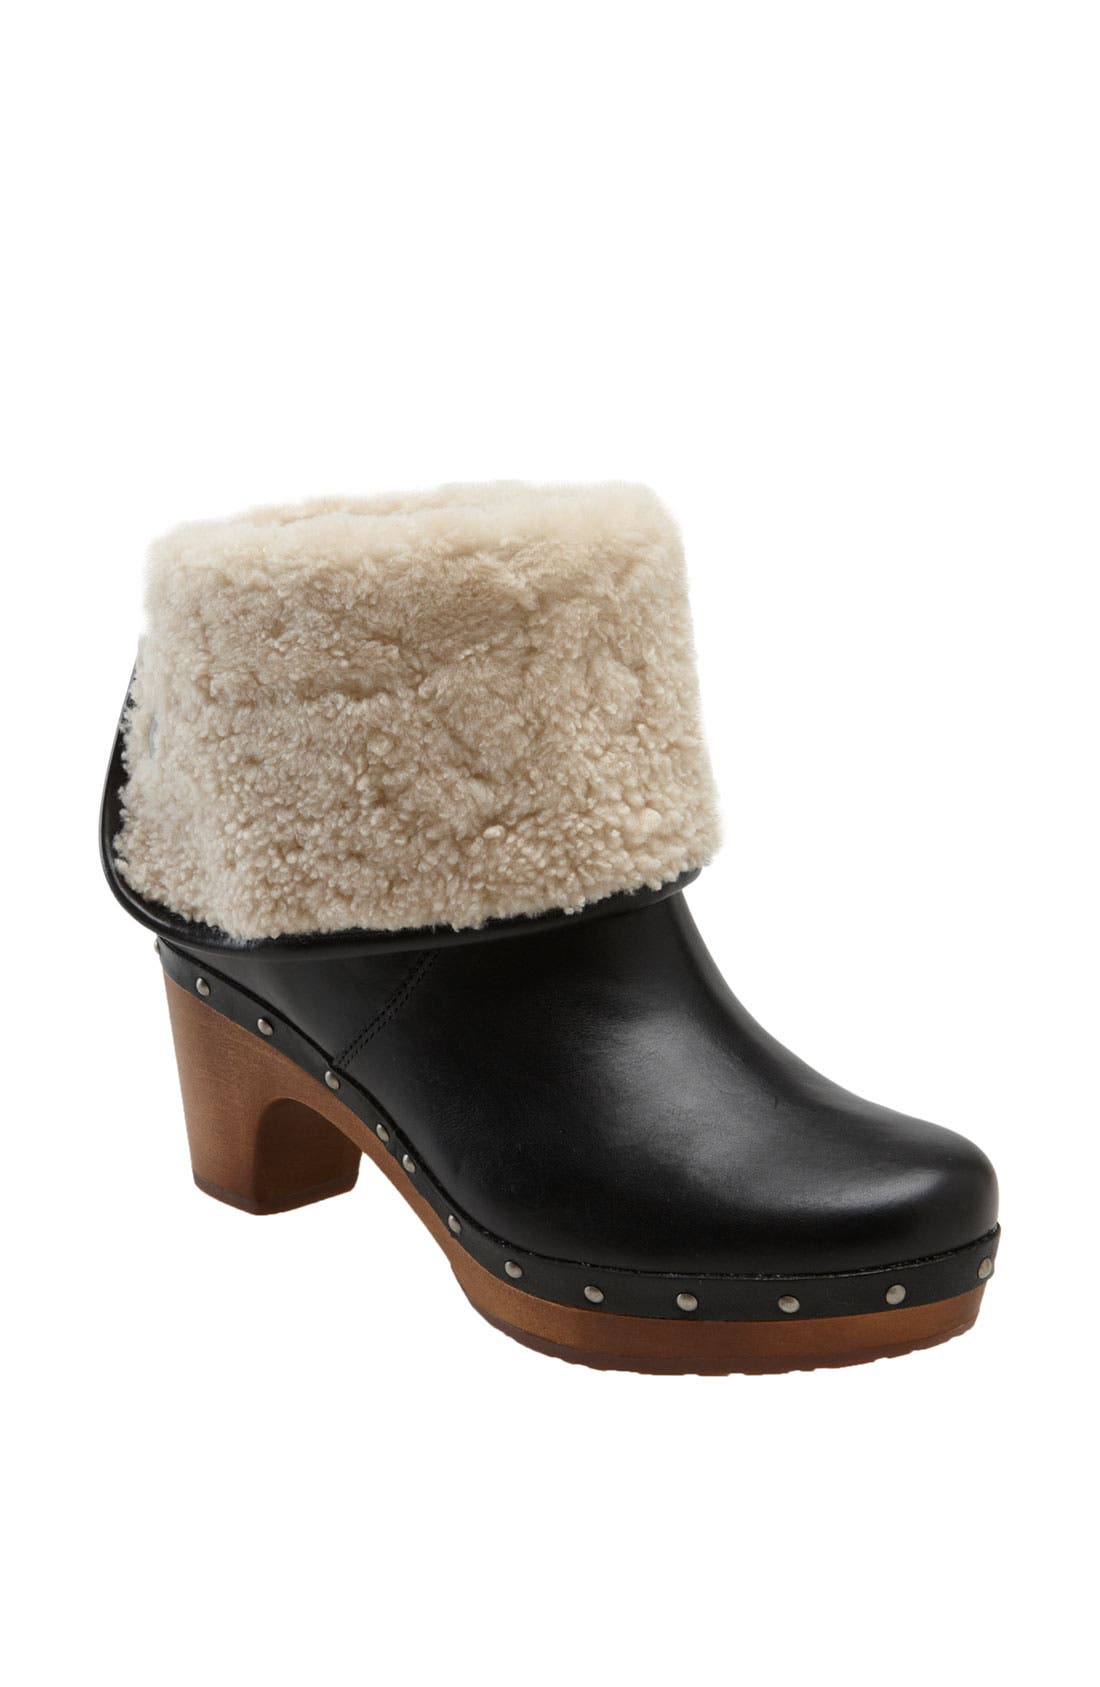 Australia 'Lynnea' Ankle Boot, Main, color, 001